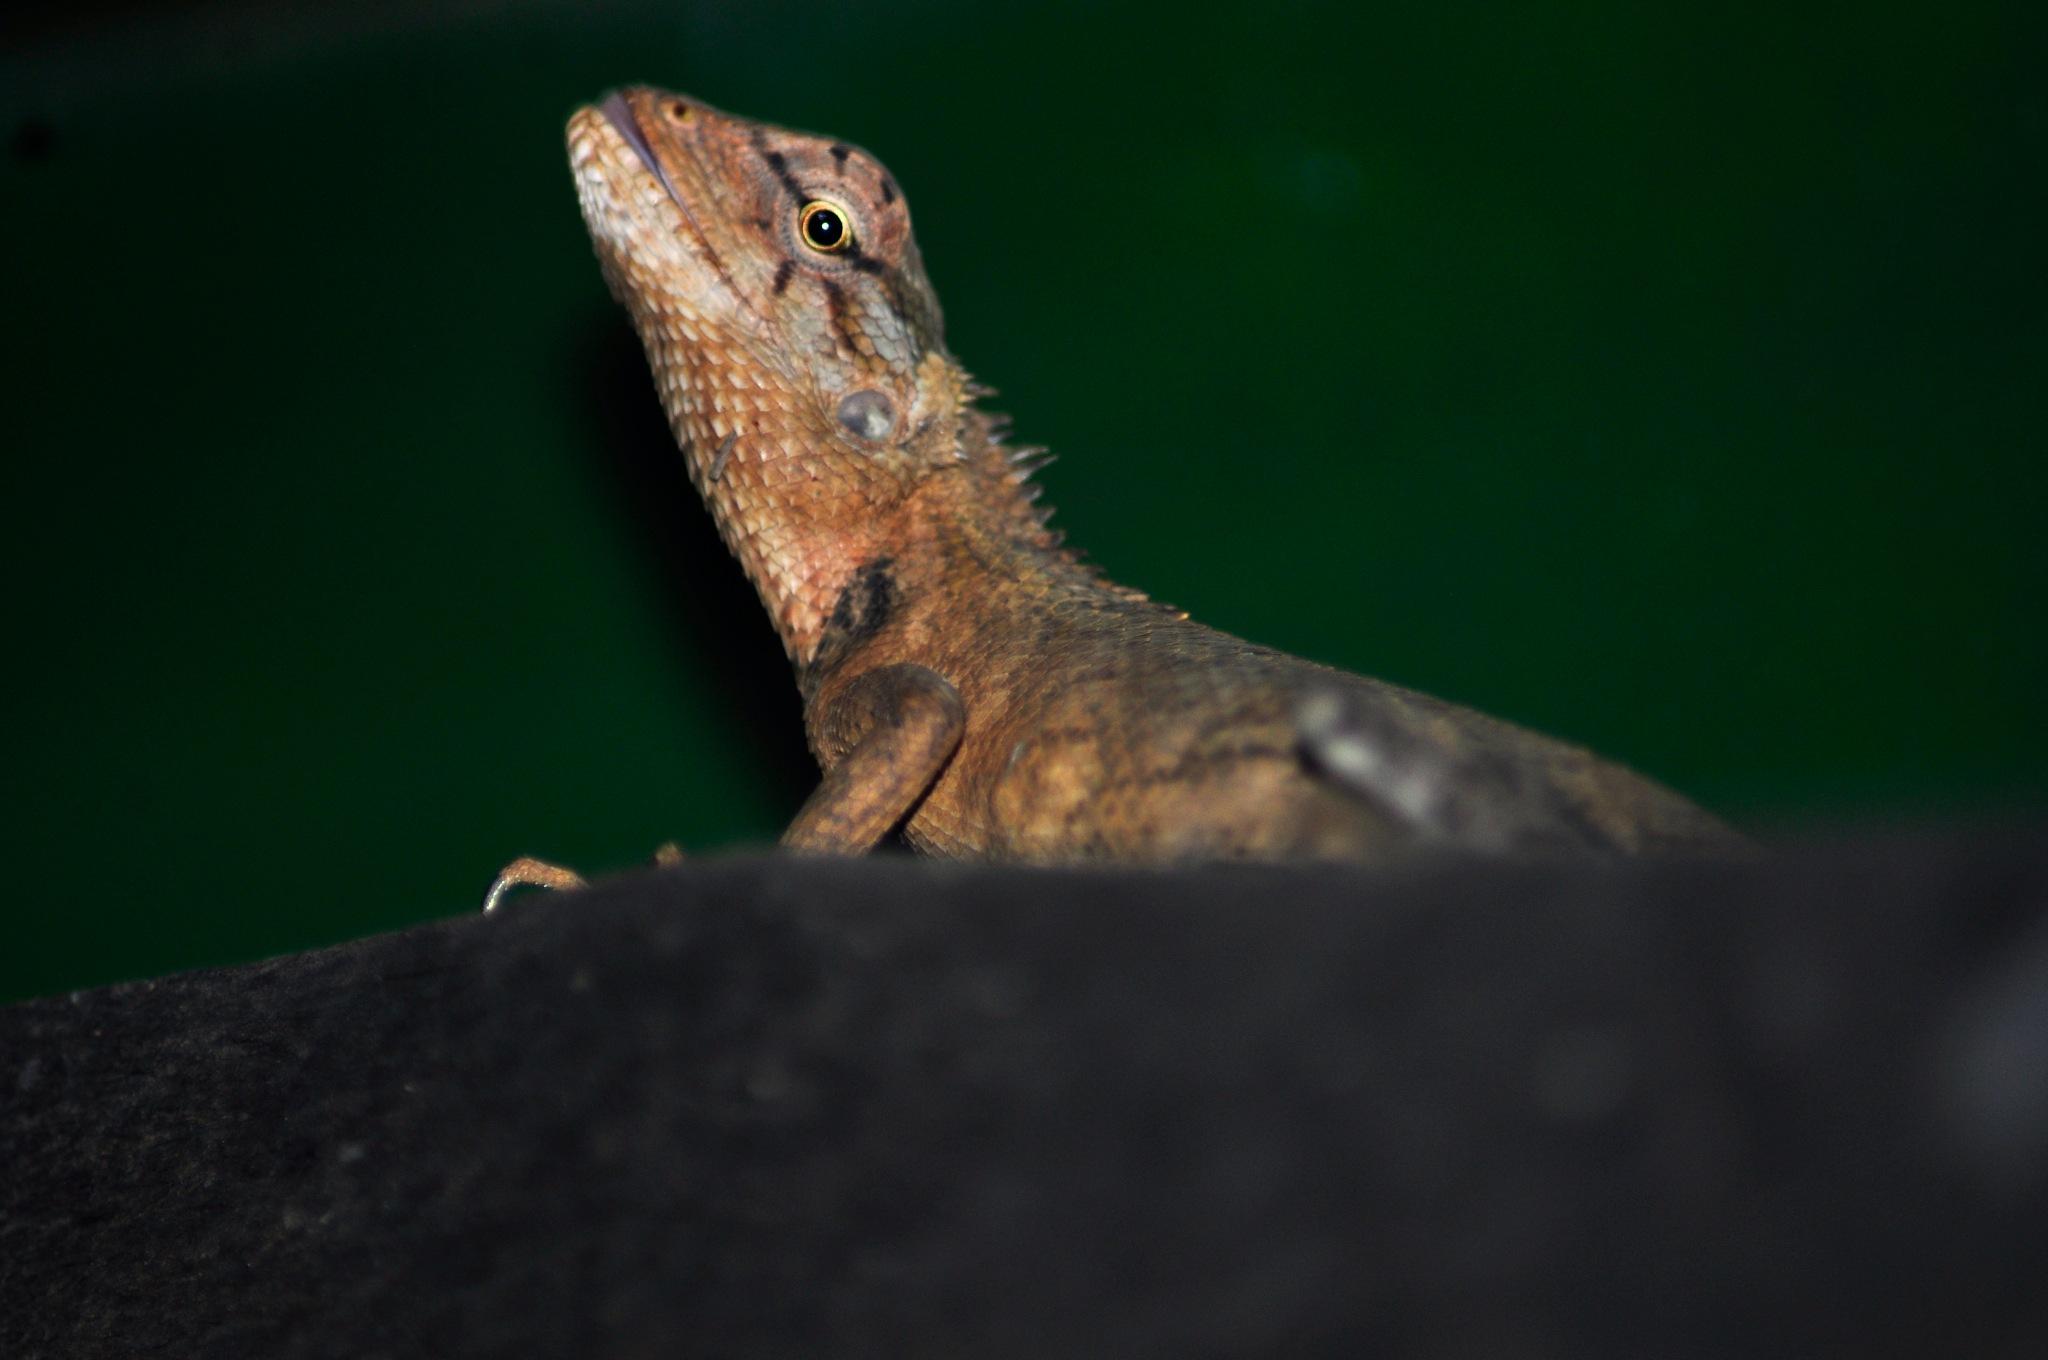 Peeking Chameleon by Vasanth